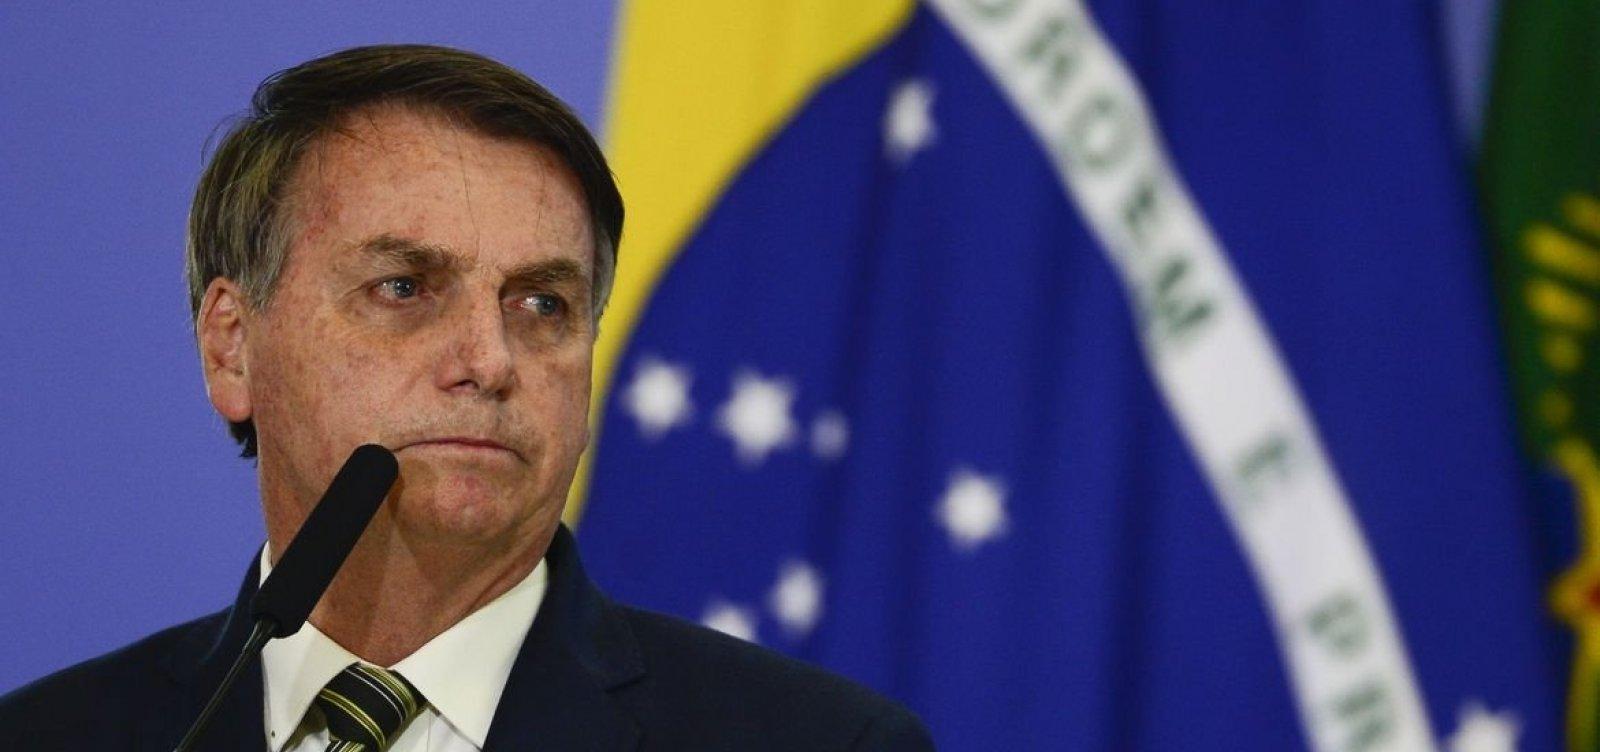 [OAB acelera pedido de impeachment de Jair Bolsonaro]